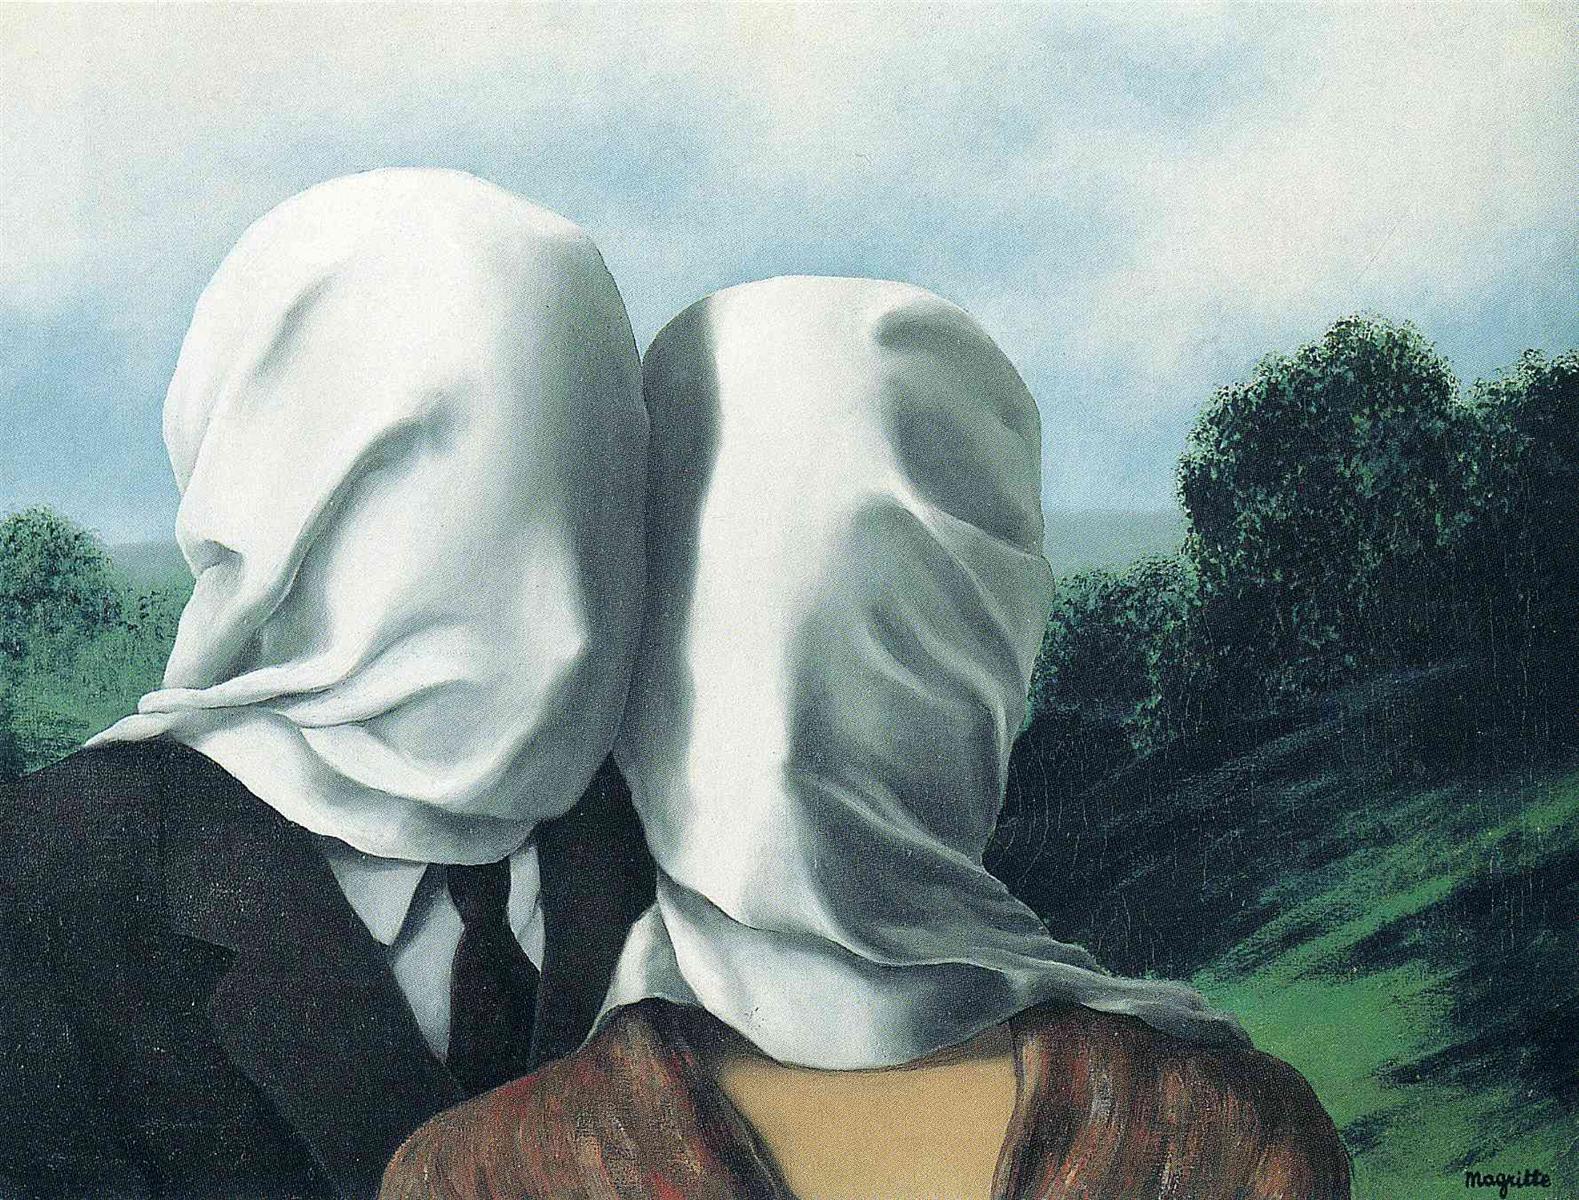 http://uploads2.wikipaintings.org/images/rene-magritte/the-lovers-1928-1(1).jpg!HD.jpg